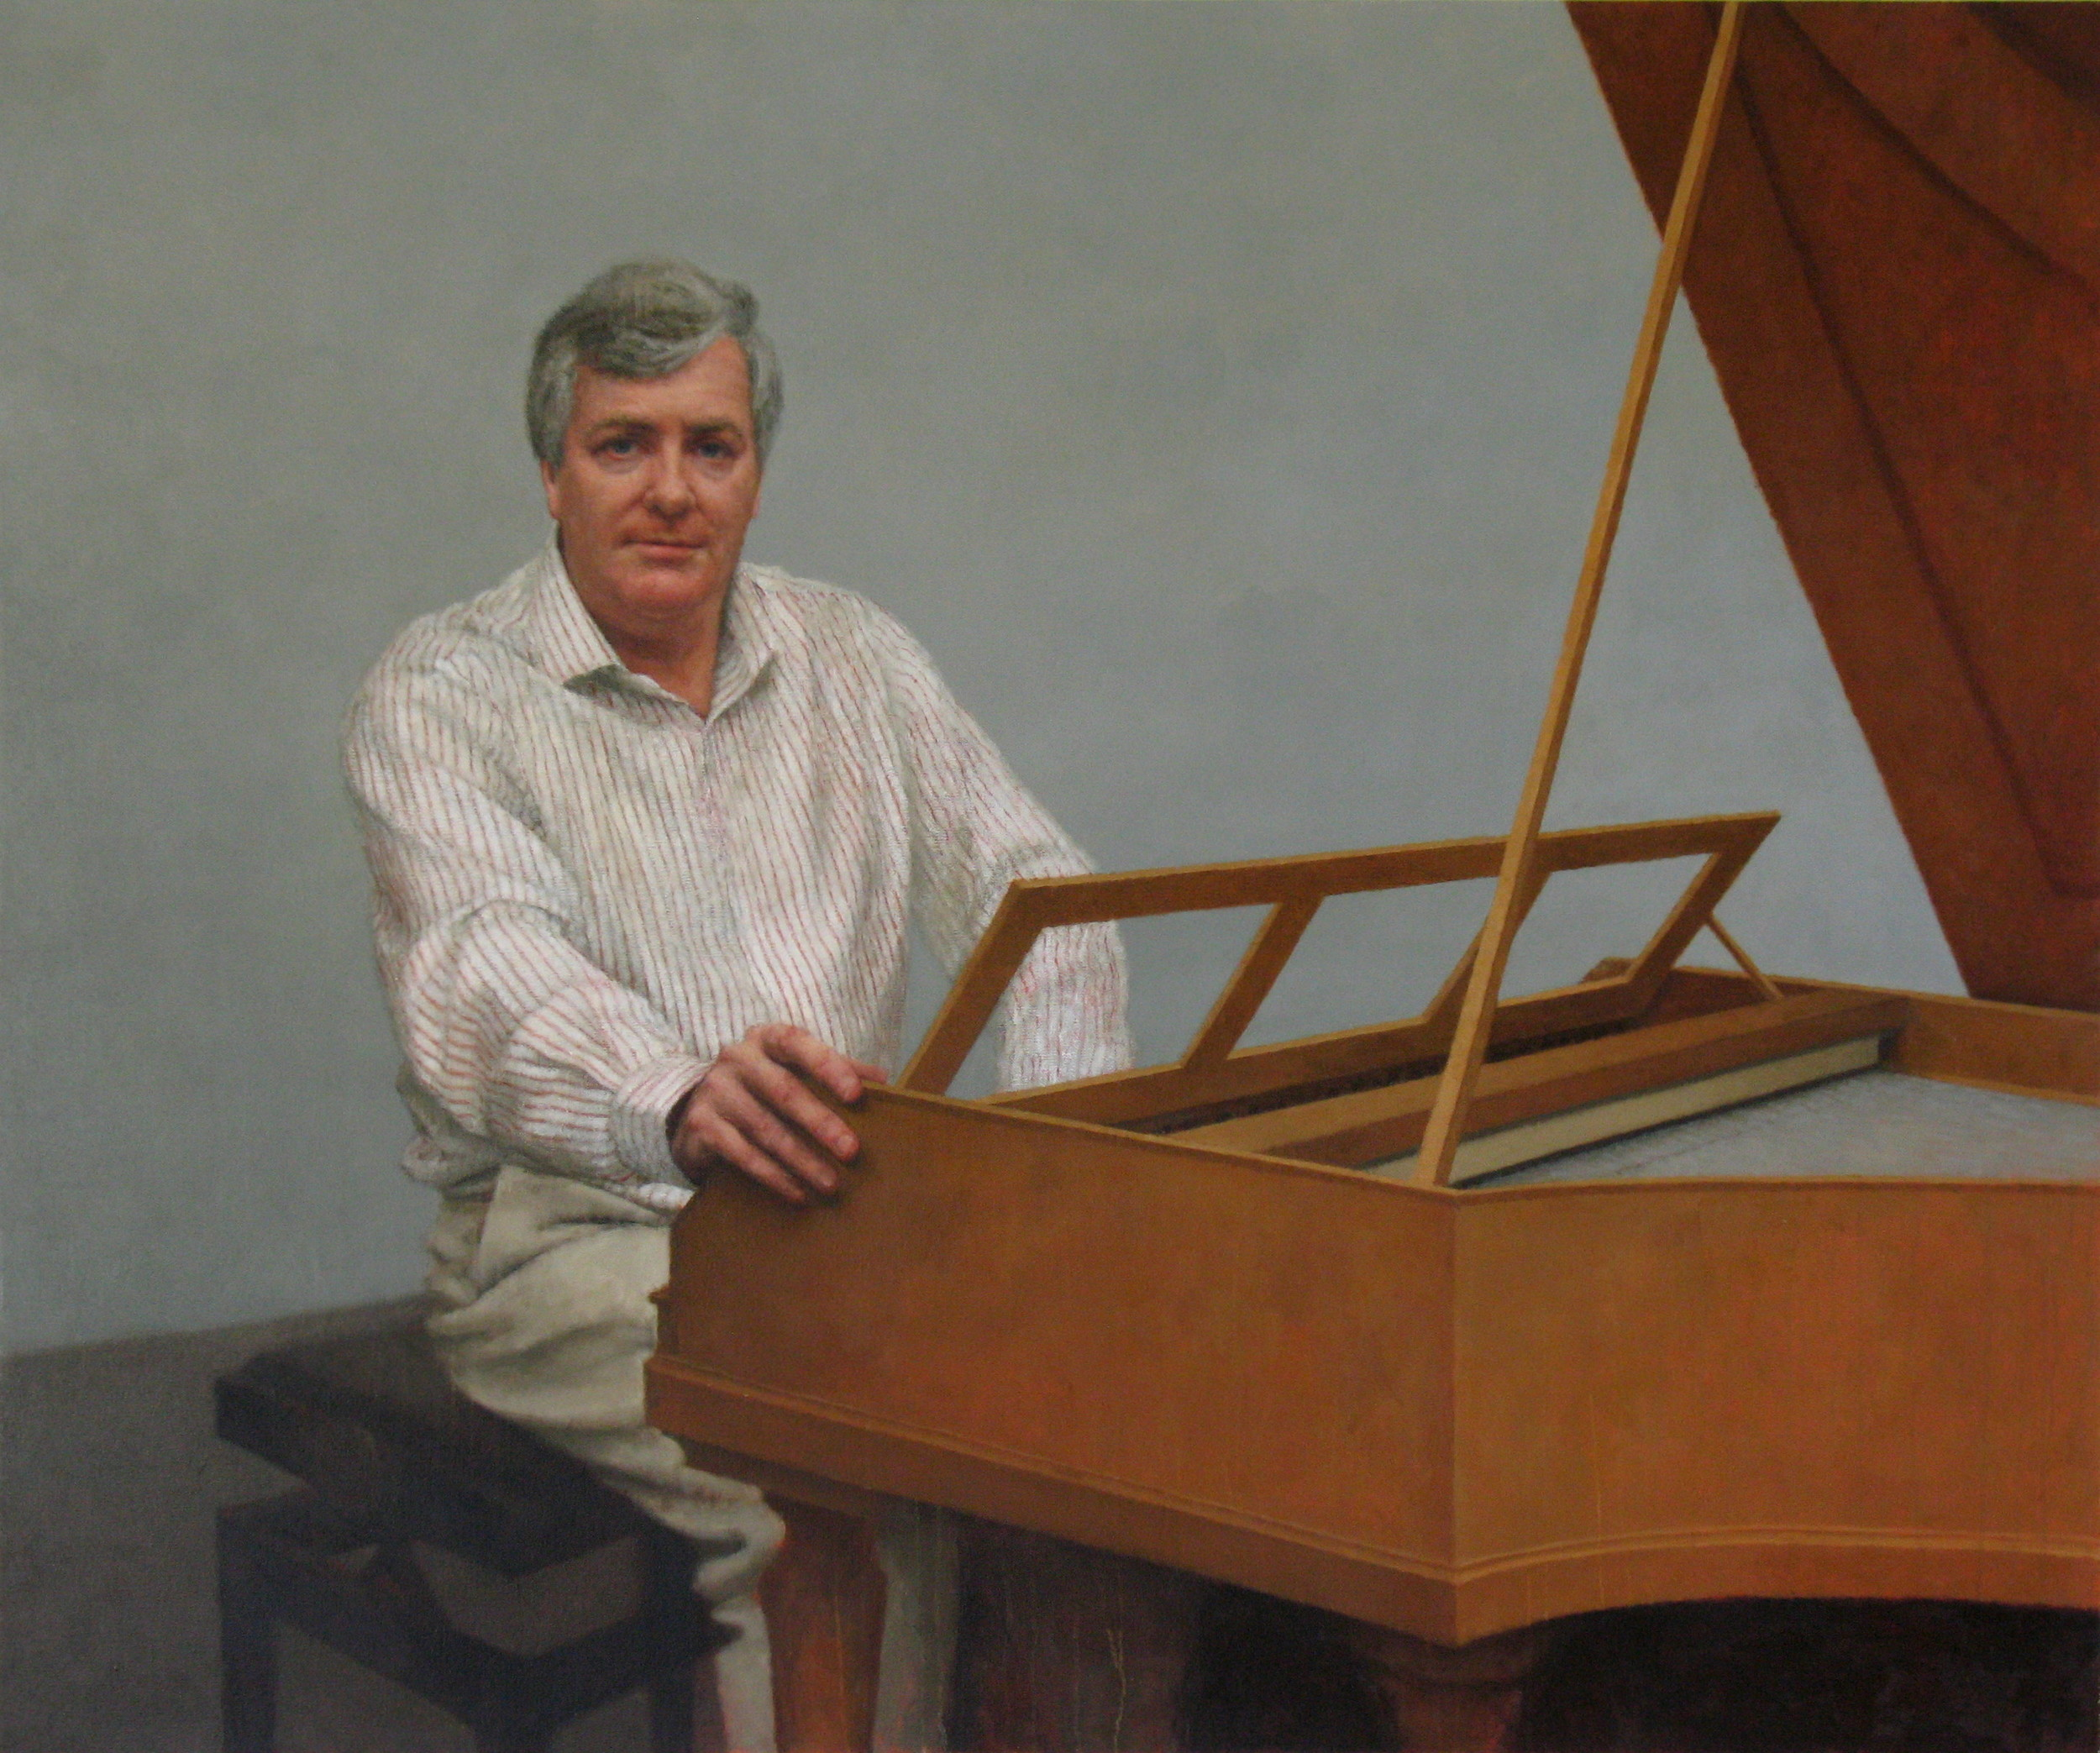 Portrait of Geoffrey Lancaster AM, 2011, Oil on linen, 1530mm x 183mm, National Portrait Gallery, Australia.